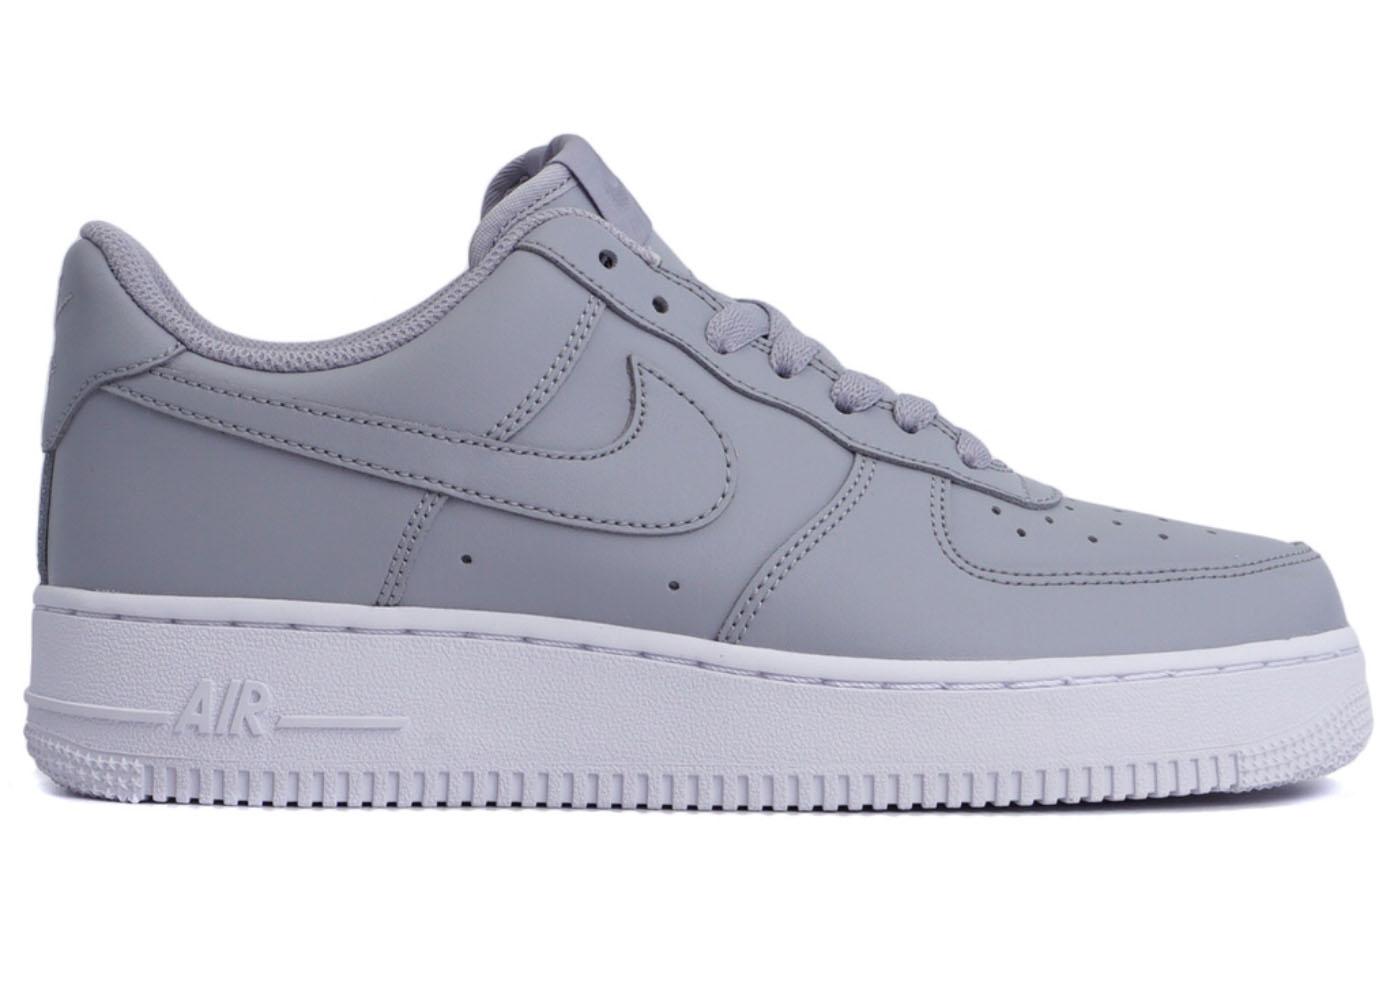 Nike Air Force 1 07 Wolf Grey White